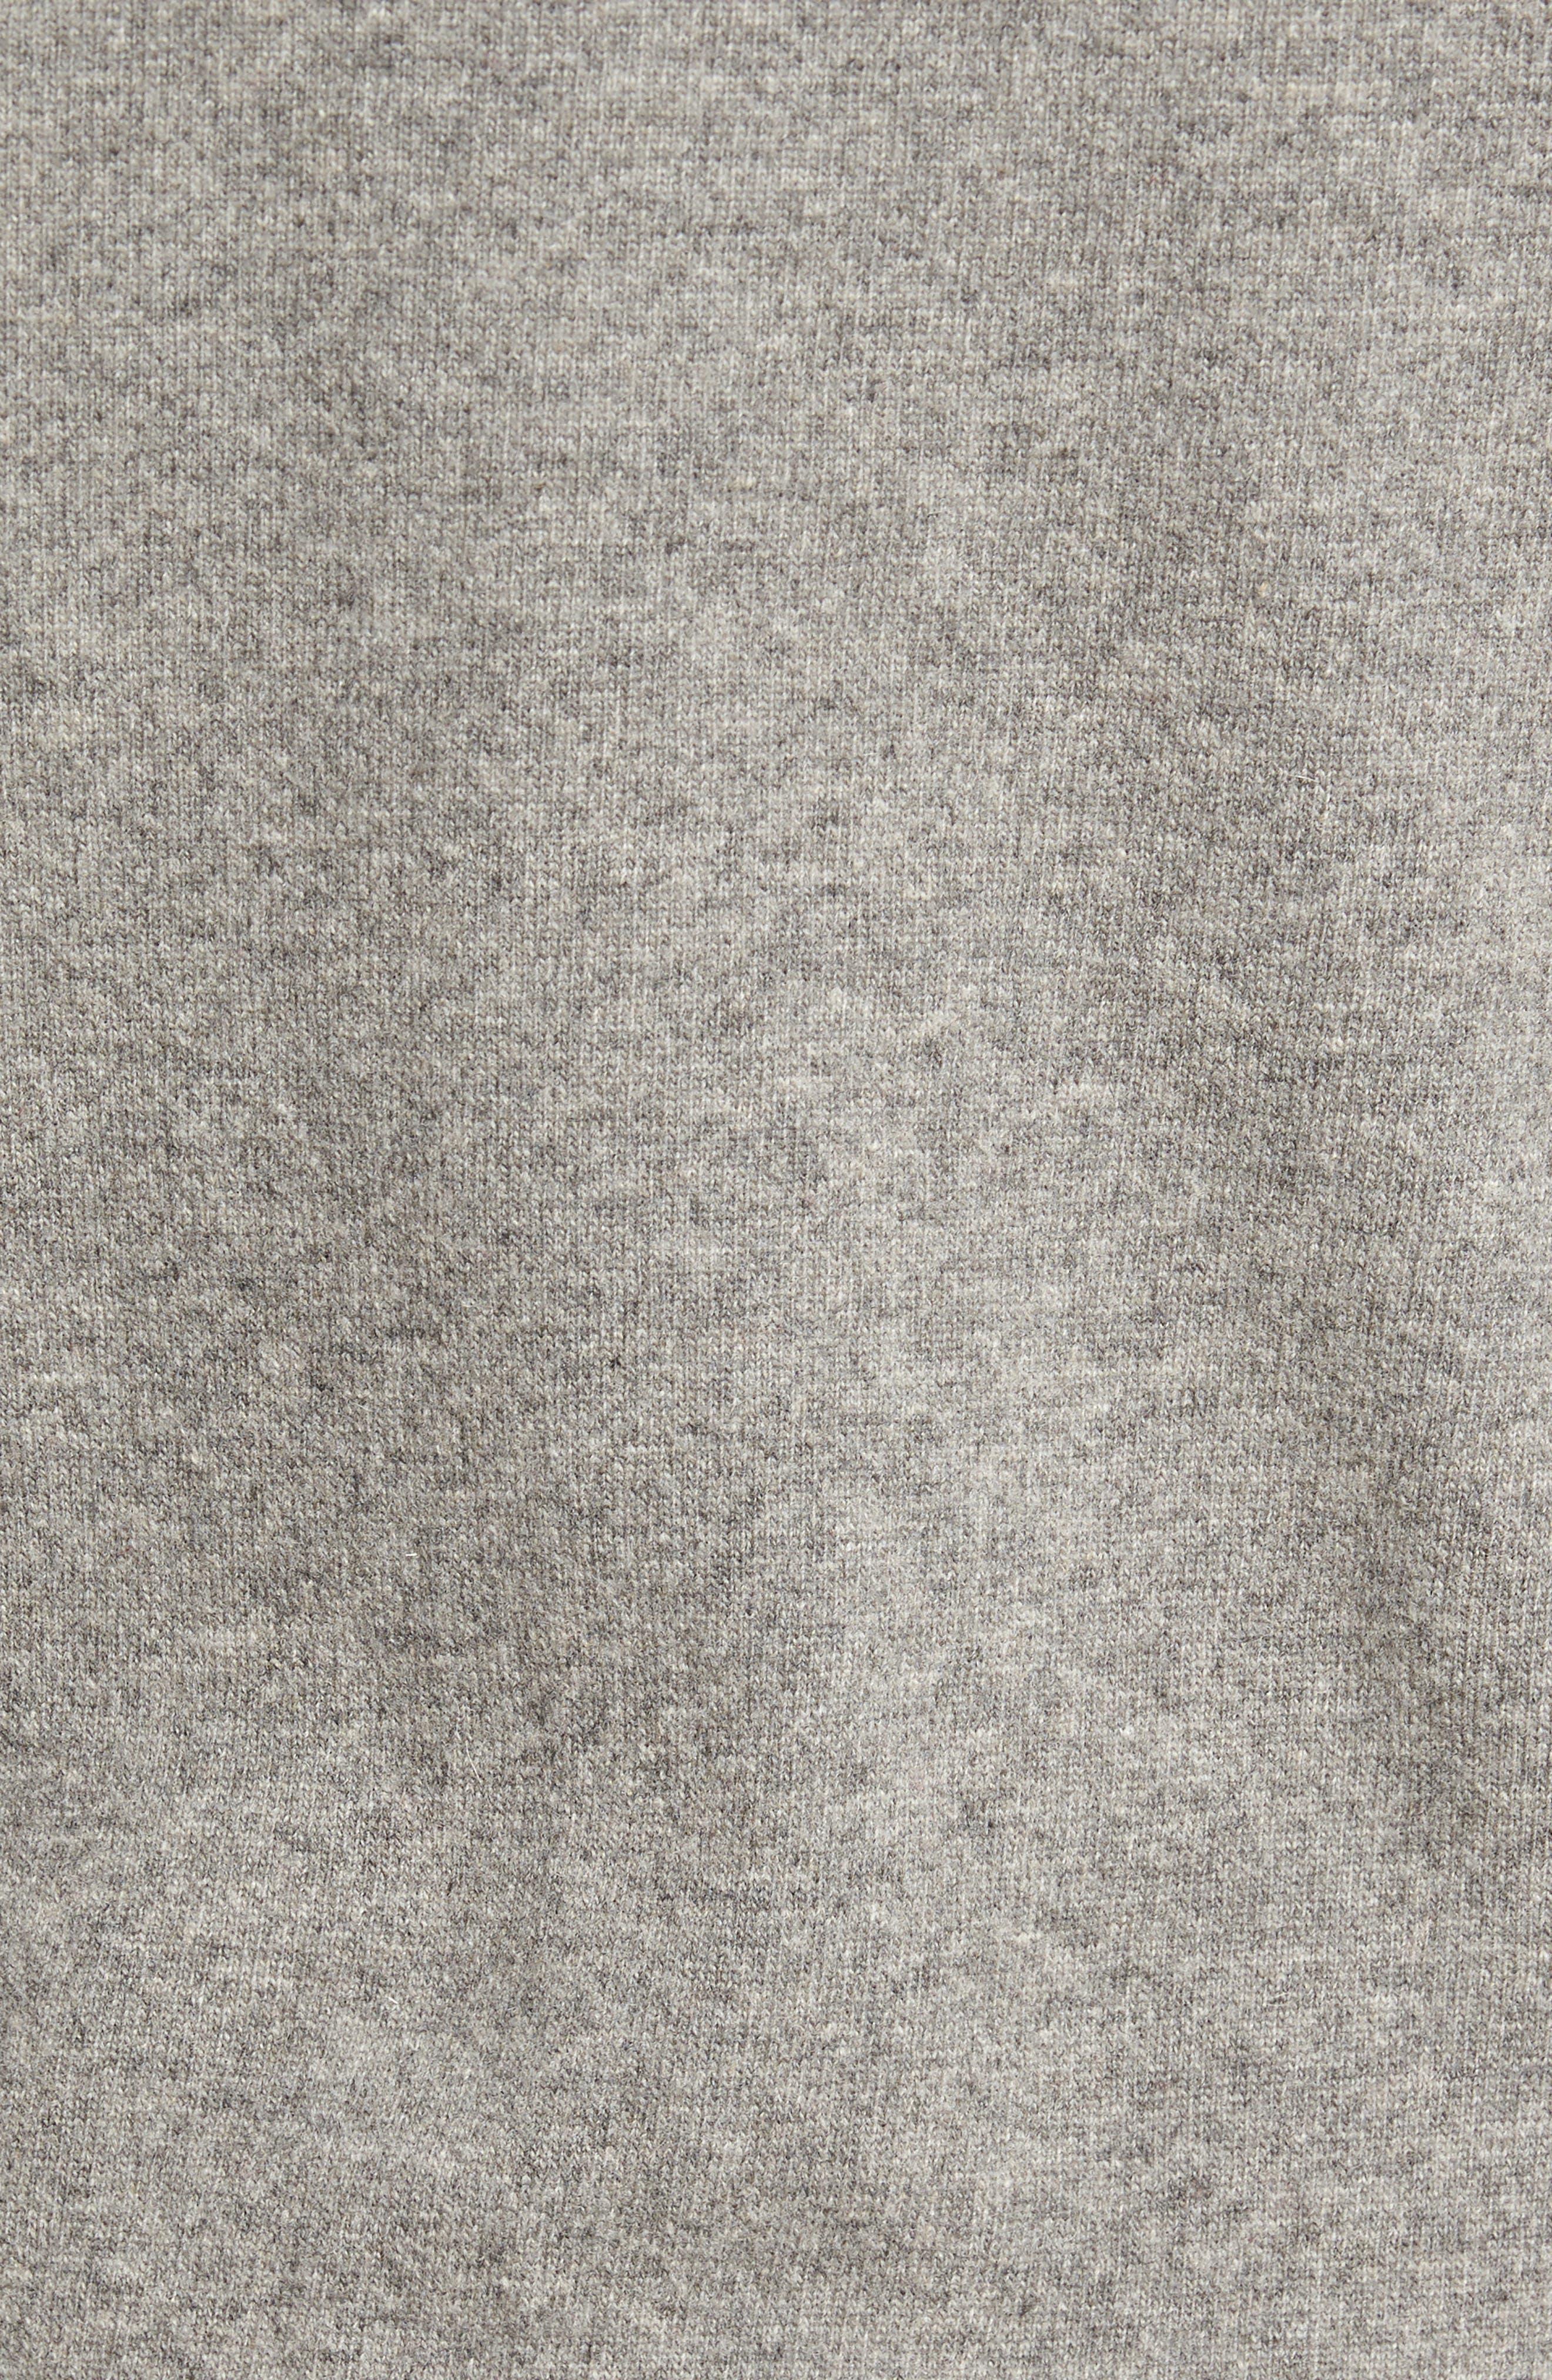 Skier Wool Blend Sweater,                             Alternate thumbnail 5, color,                             Mid Grey/ Crimson